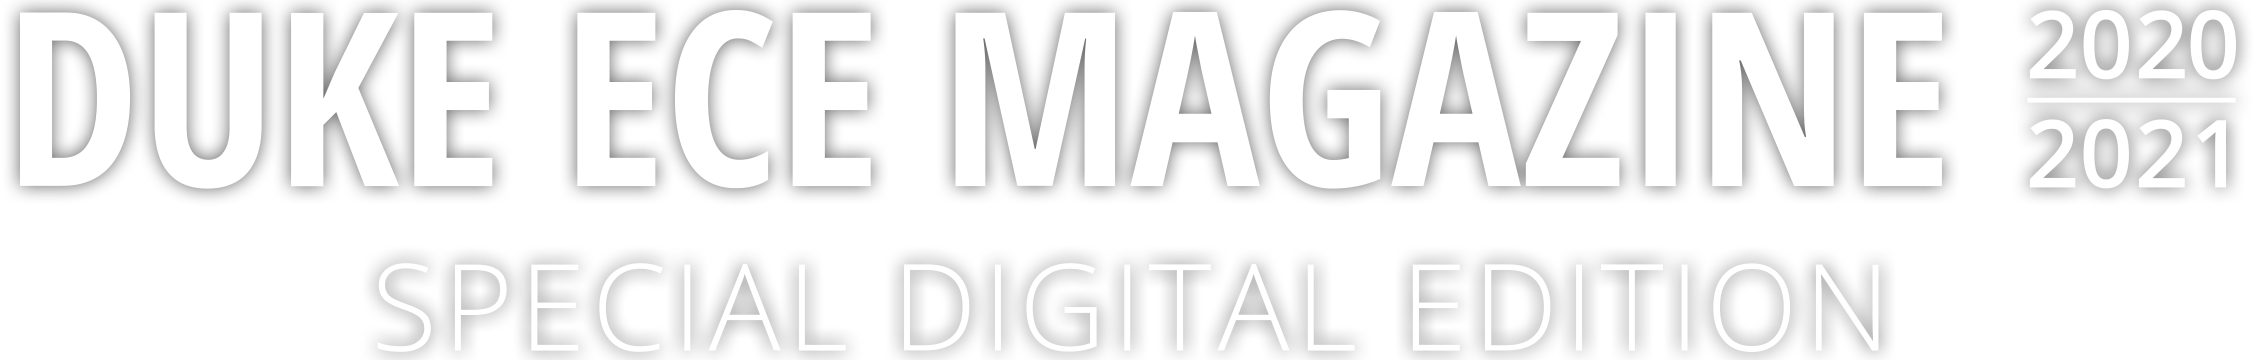 Duke ECE Magazine 2020-2021 Special Digital Edition